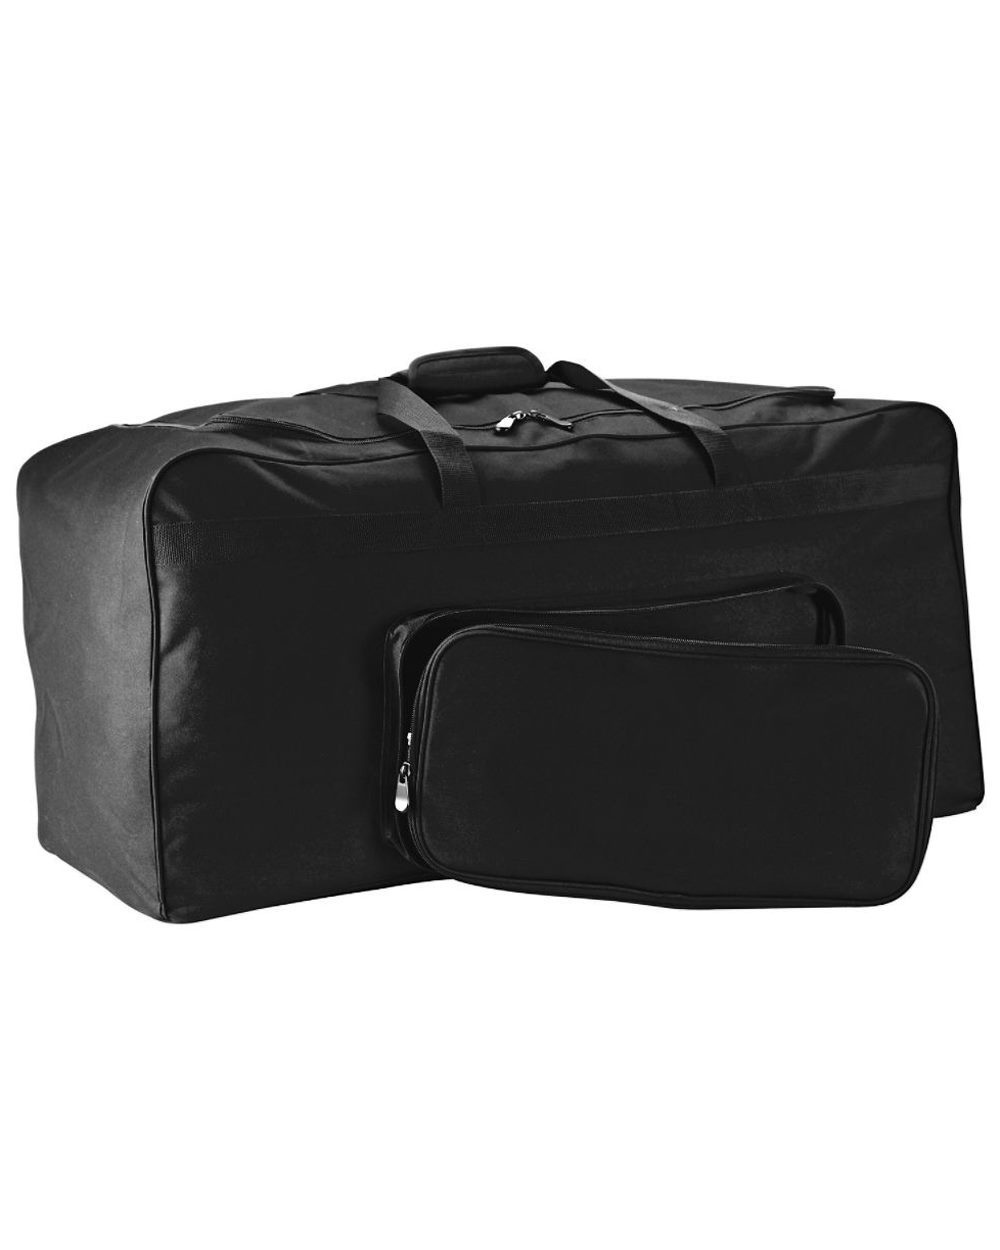 ebcaa7cfee2d Augusta 210 Denier Nylon Sports Bag - from $1.56